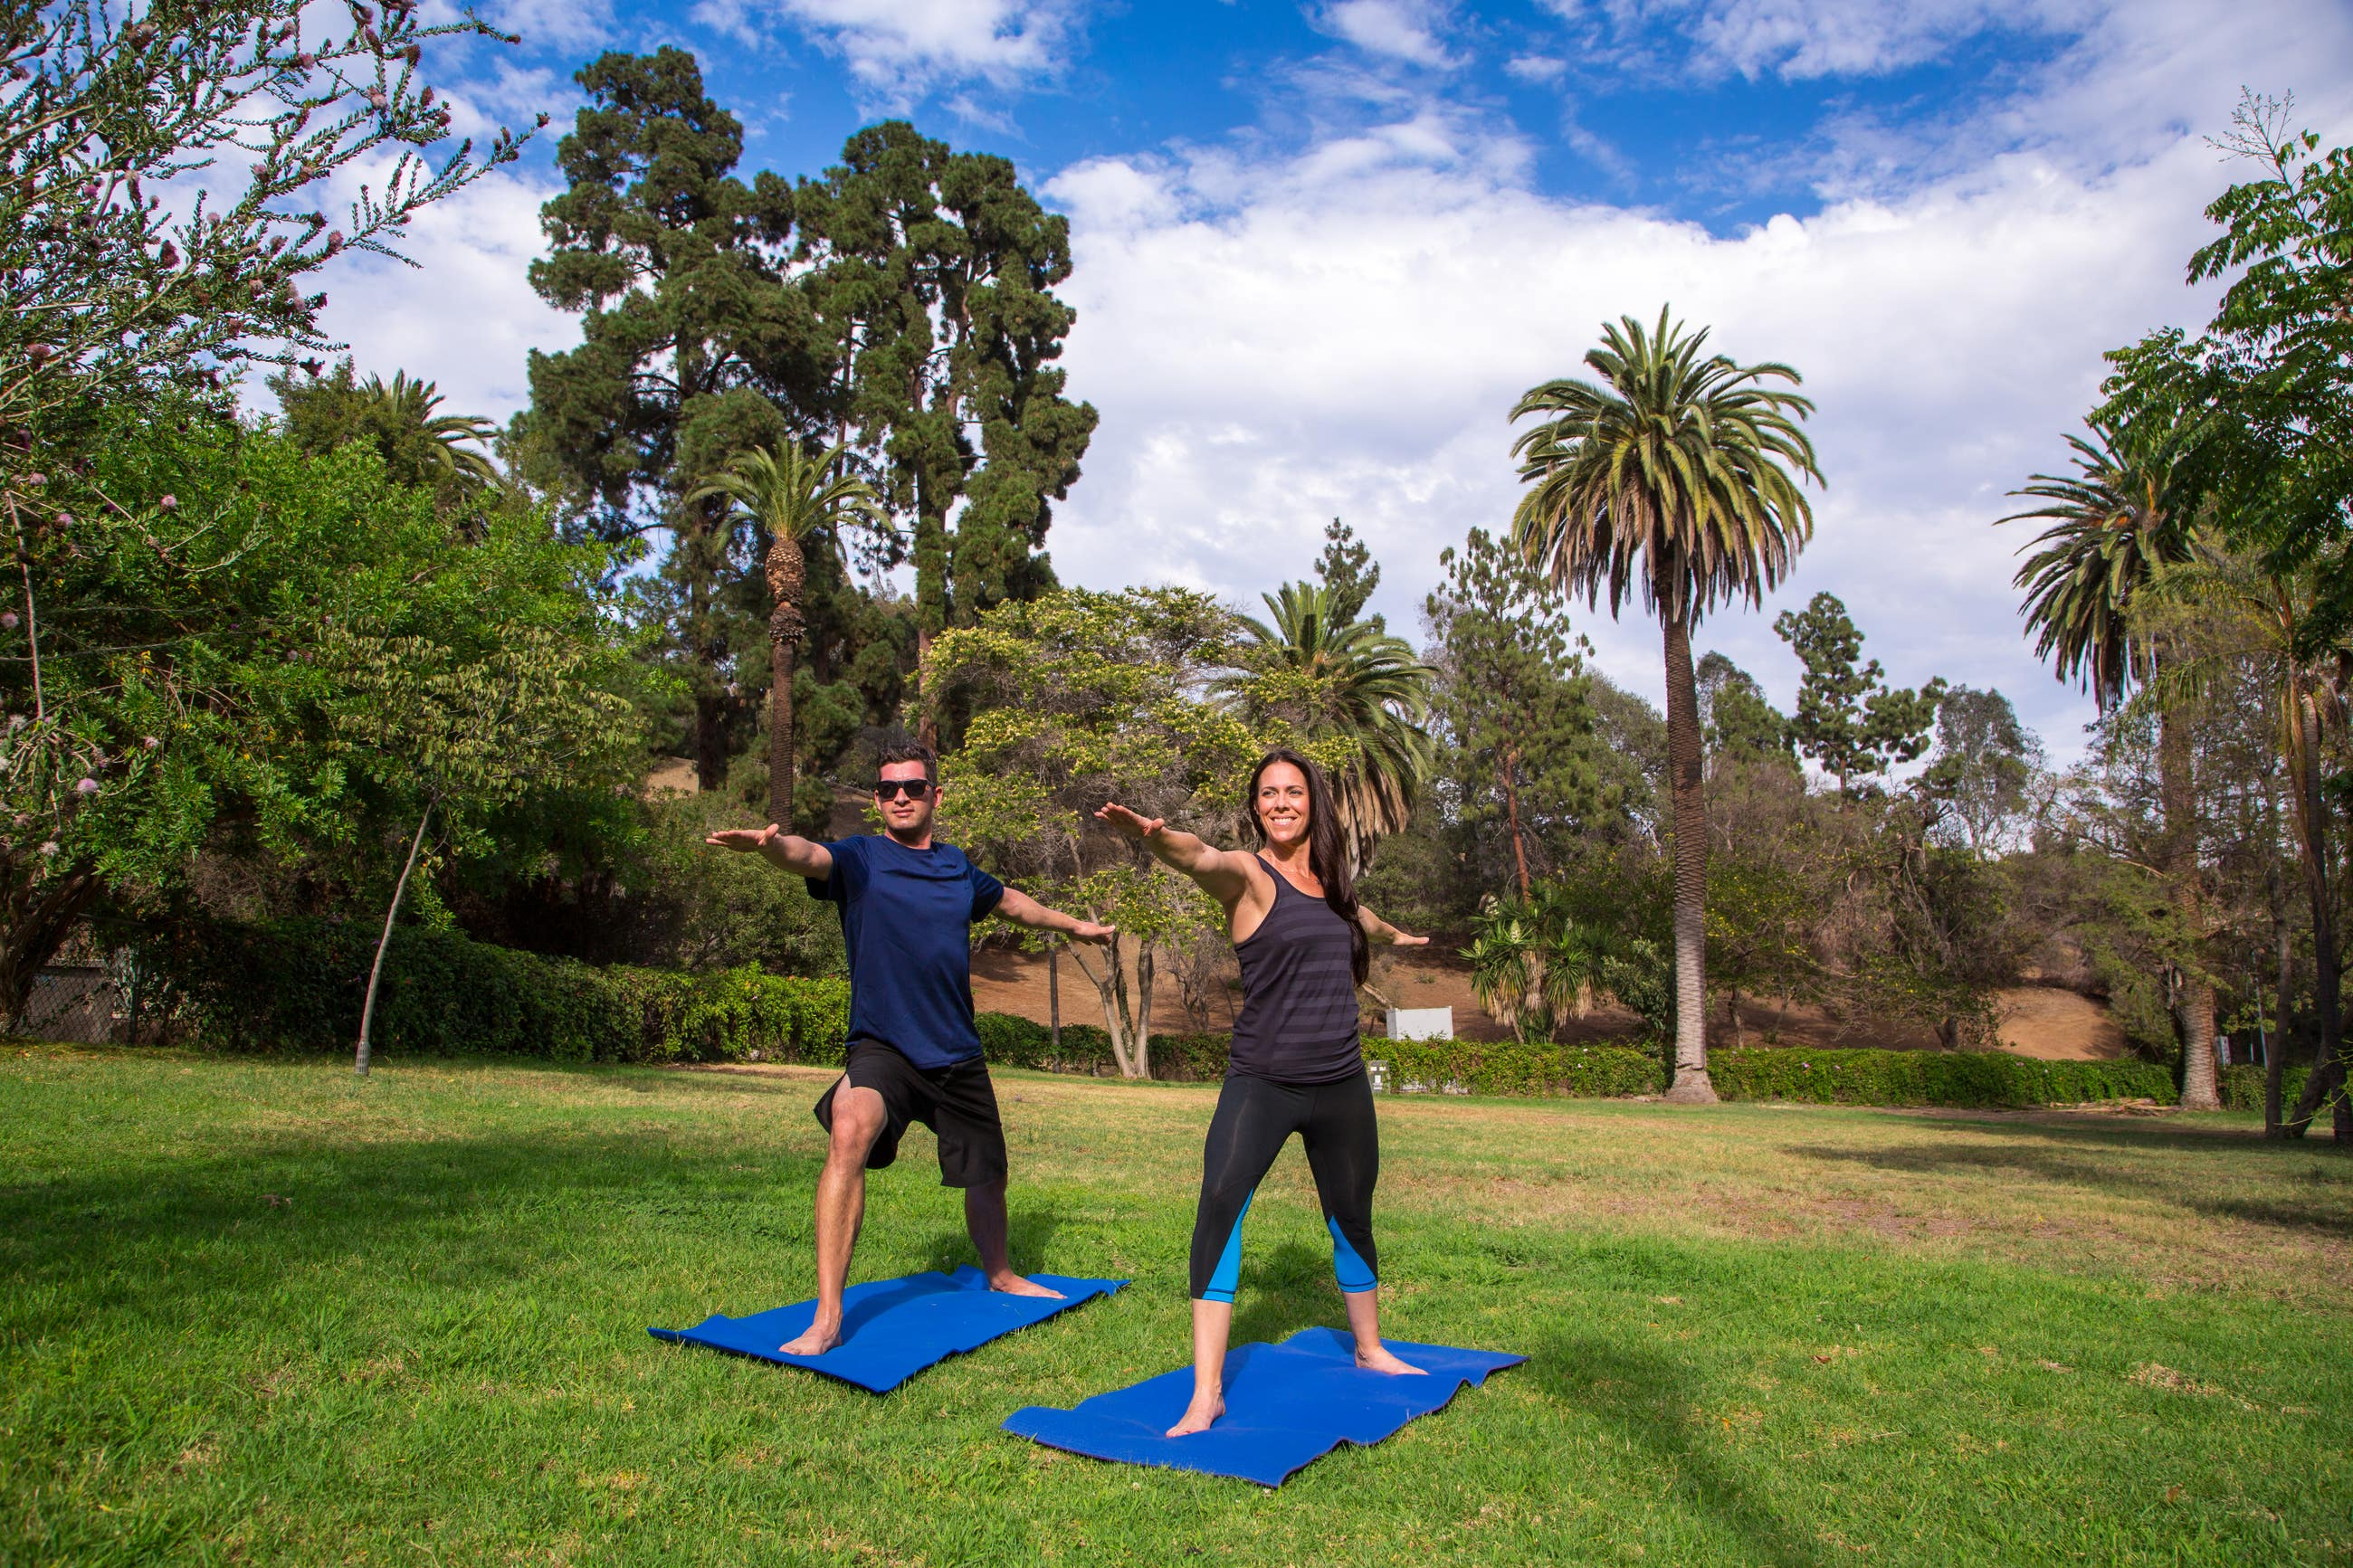 Yoga in Runyon Canyon